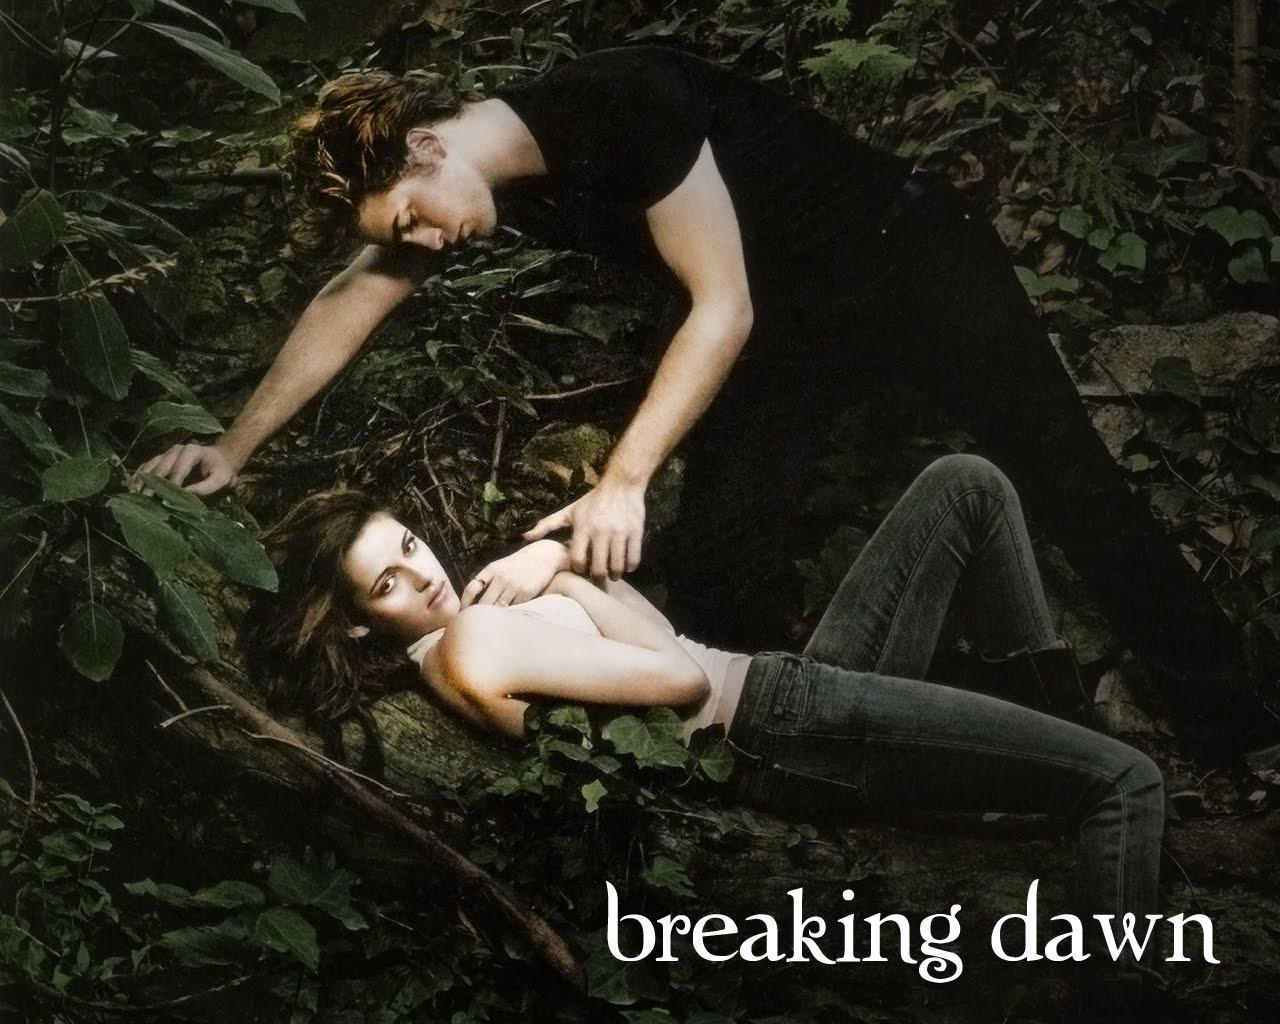 http://1.bp.blogspot.com/_H_wbQtT05C0/TFaRDPaYofI/AAAAAAAAAgY/24dyGgvsP18/s1600/breaking+dawn+scene.jpg